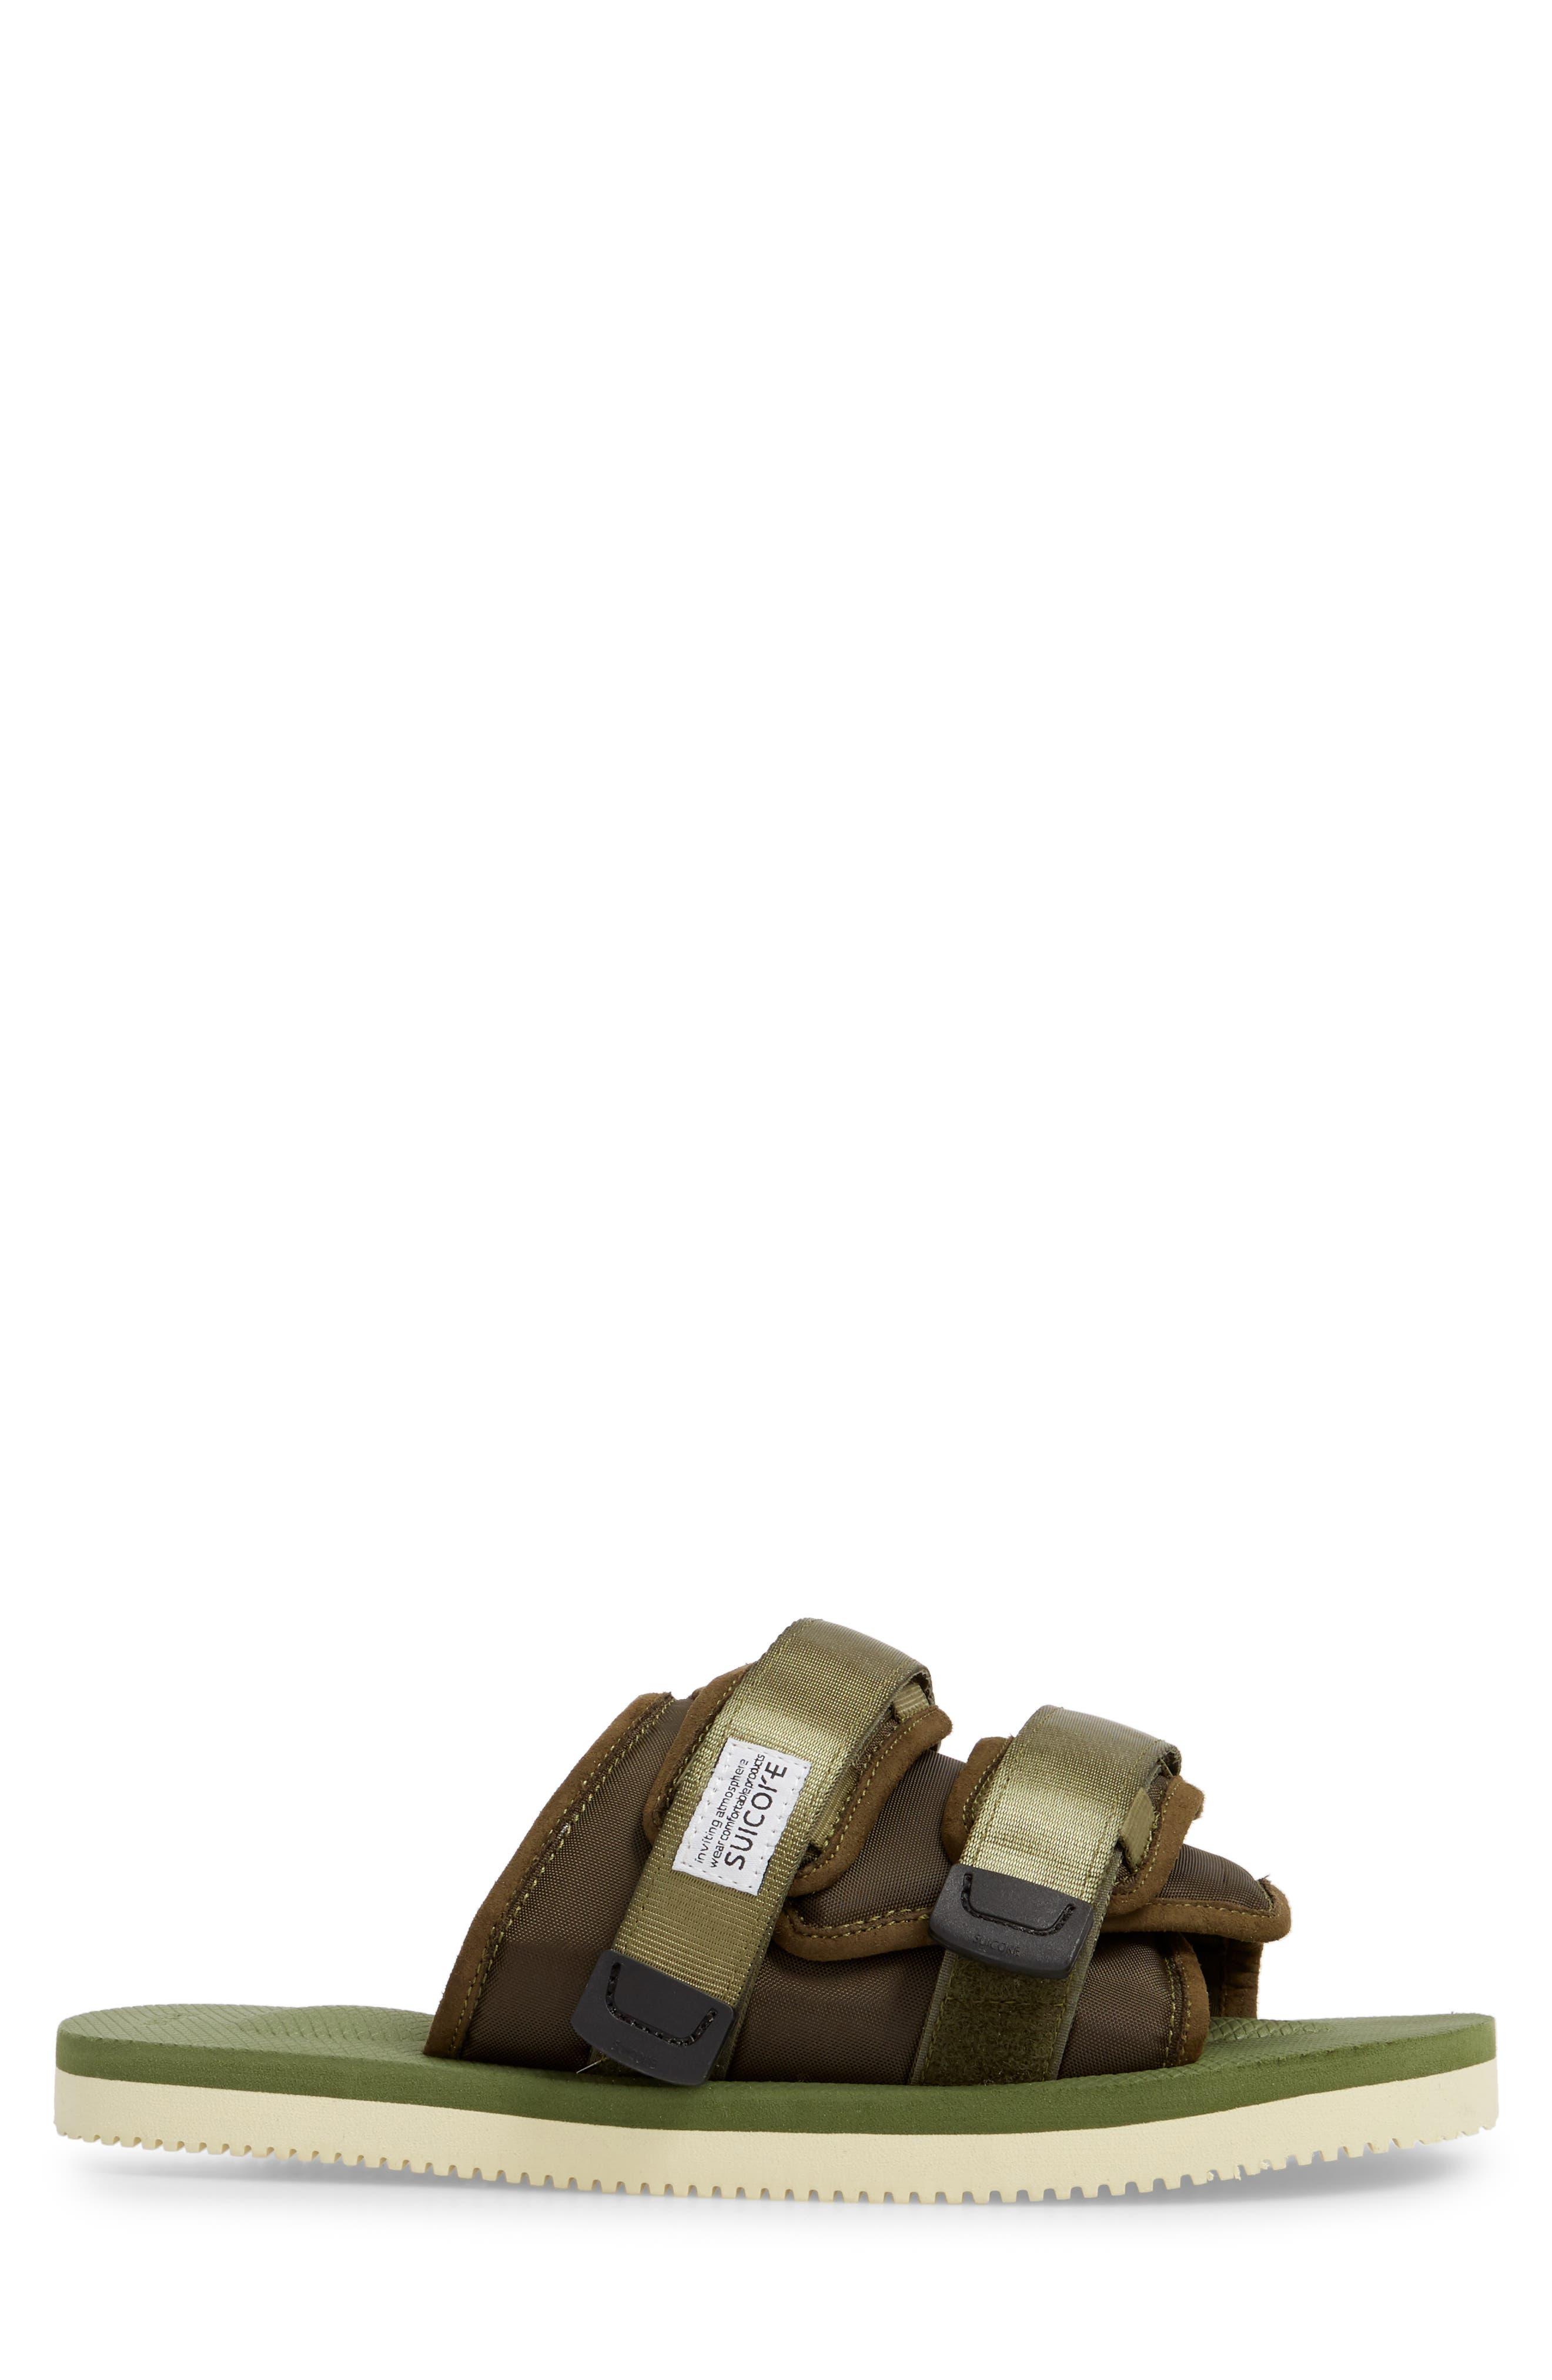 Alternate Image 3  - Suicoke Moto Cab Slide Sandal (Men)